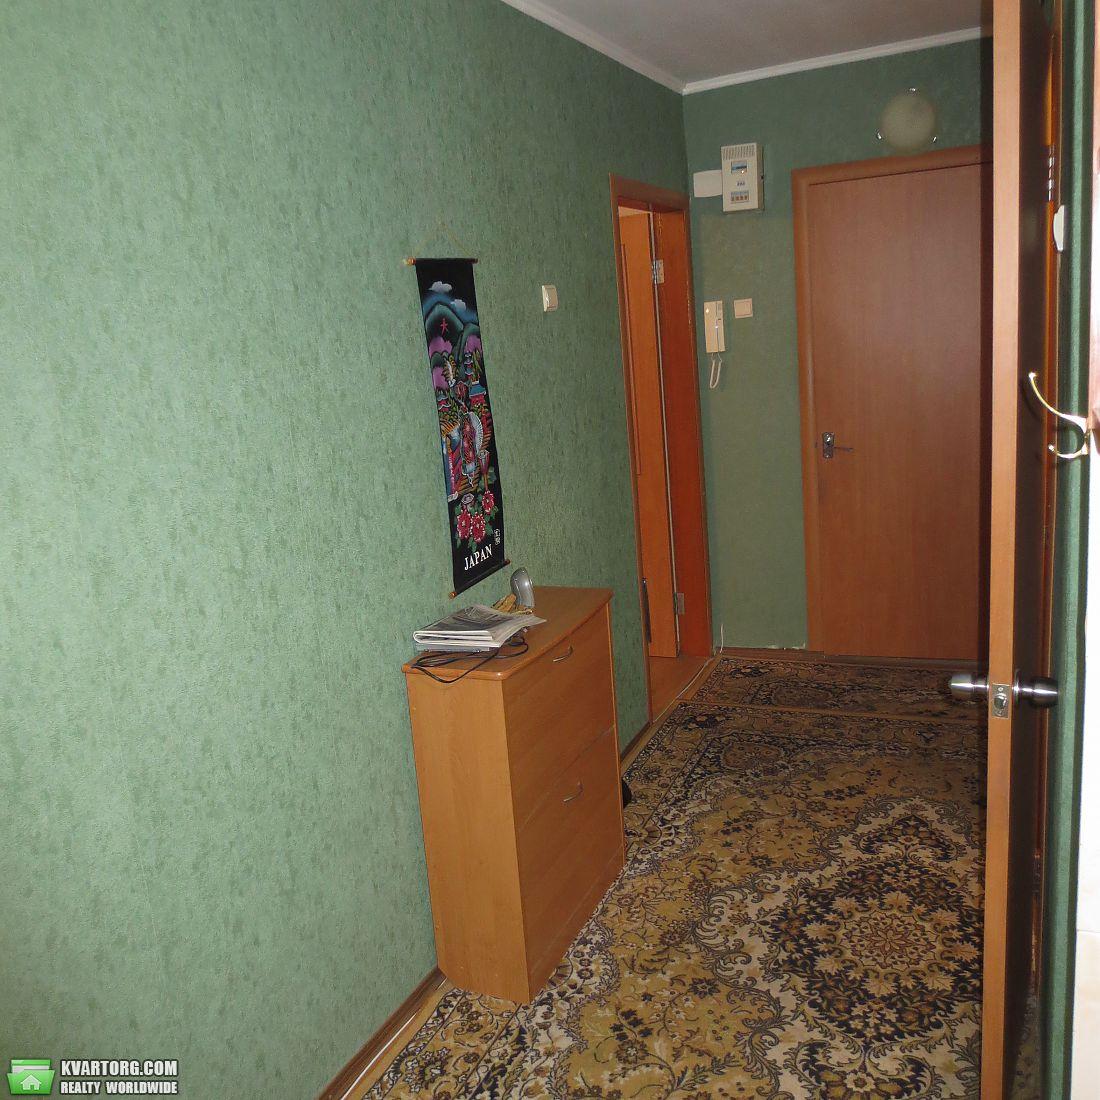 сдам 1-комнатную квартиру Киев, ул. Малиновского 13-Б - Фото 4